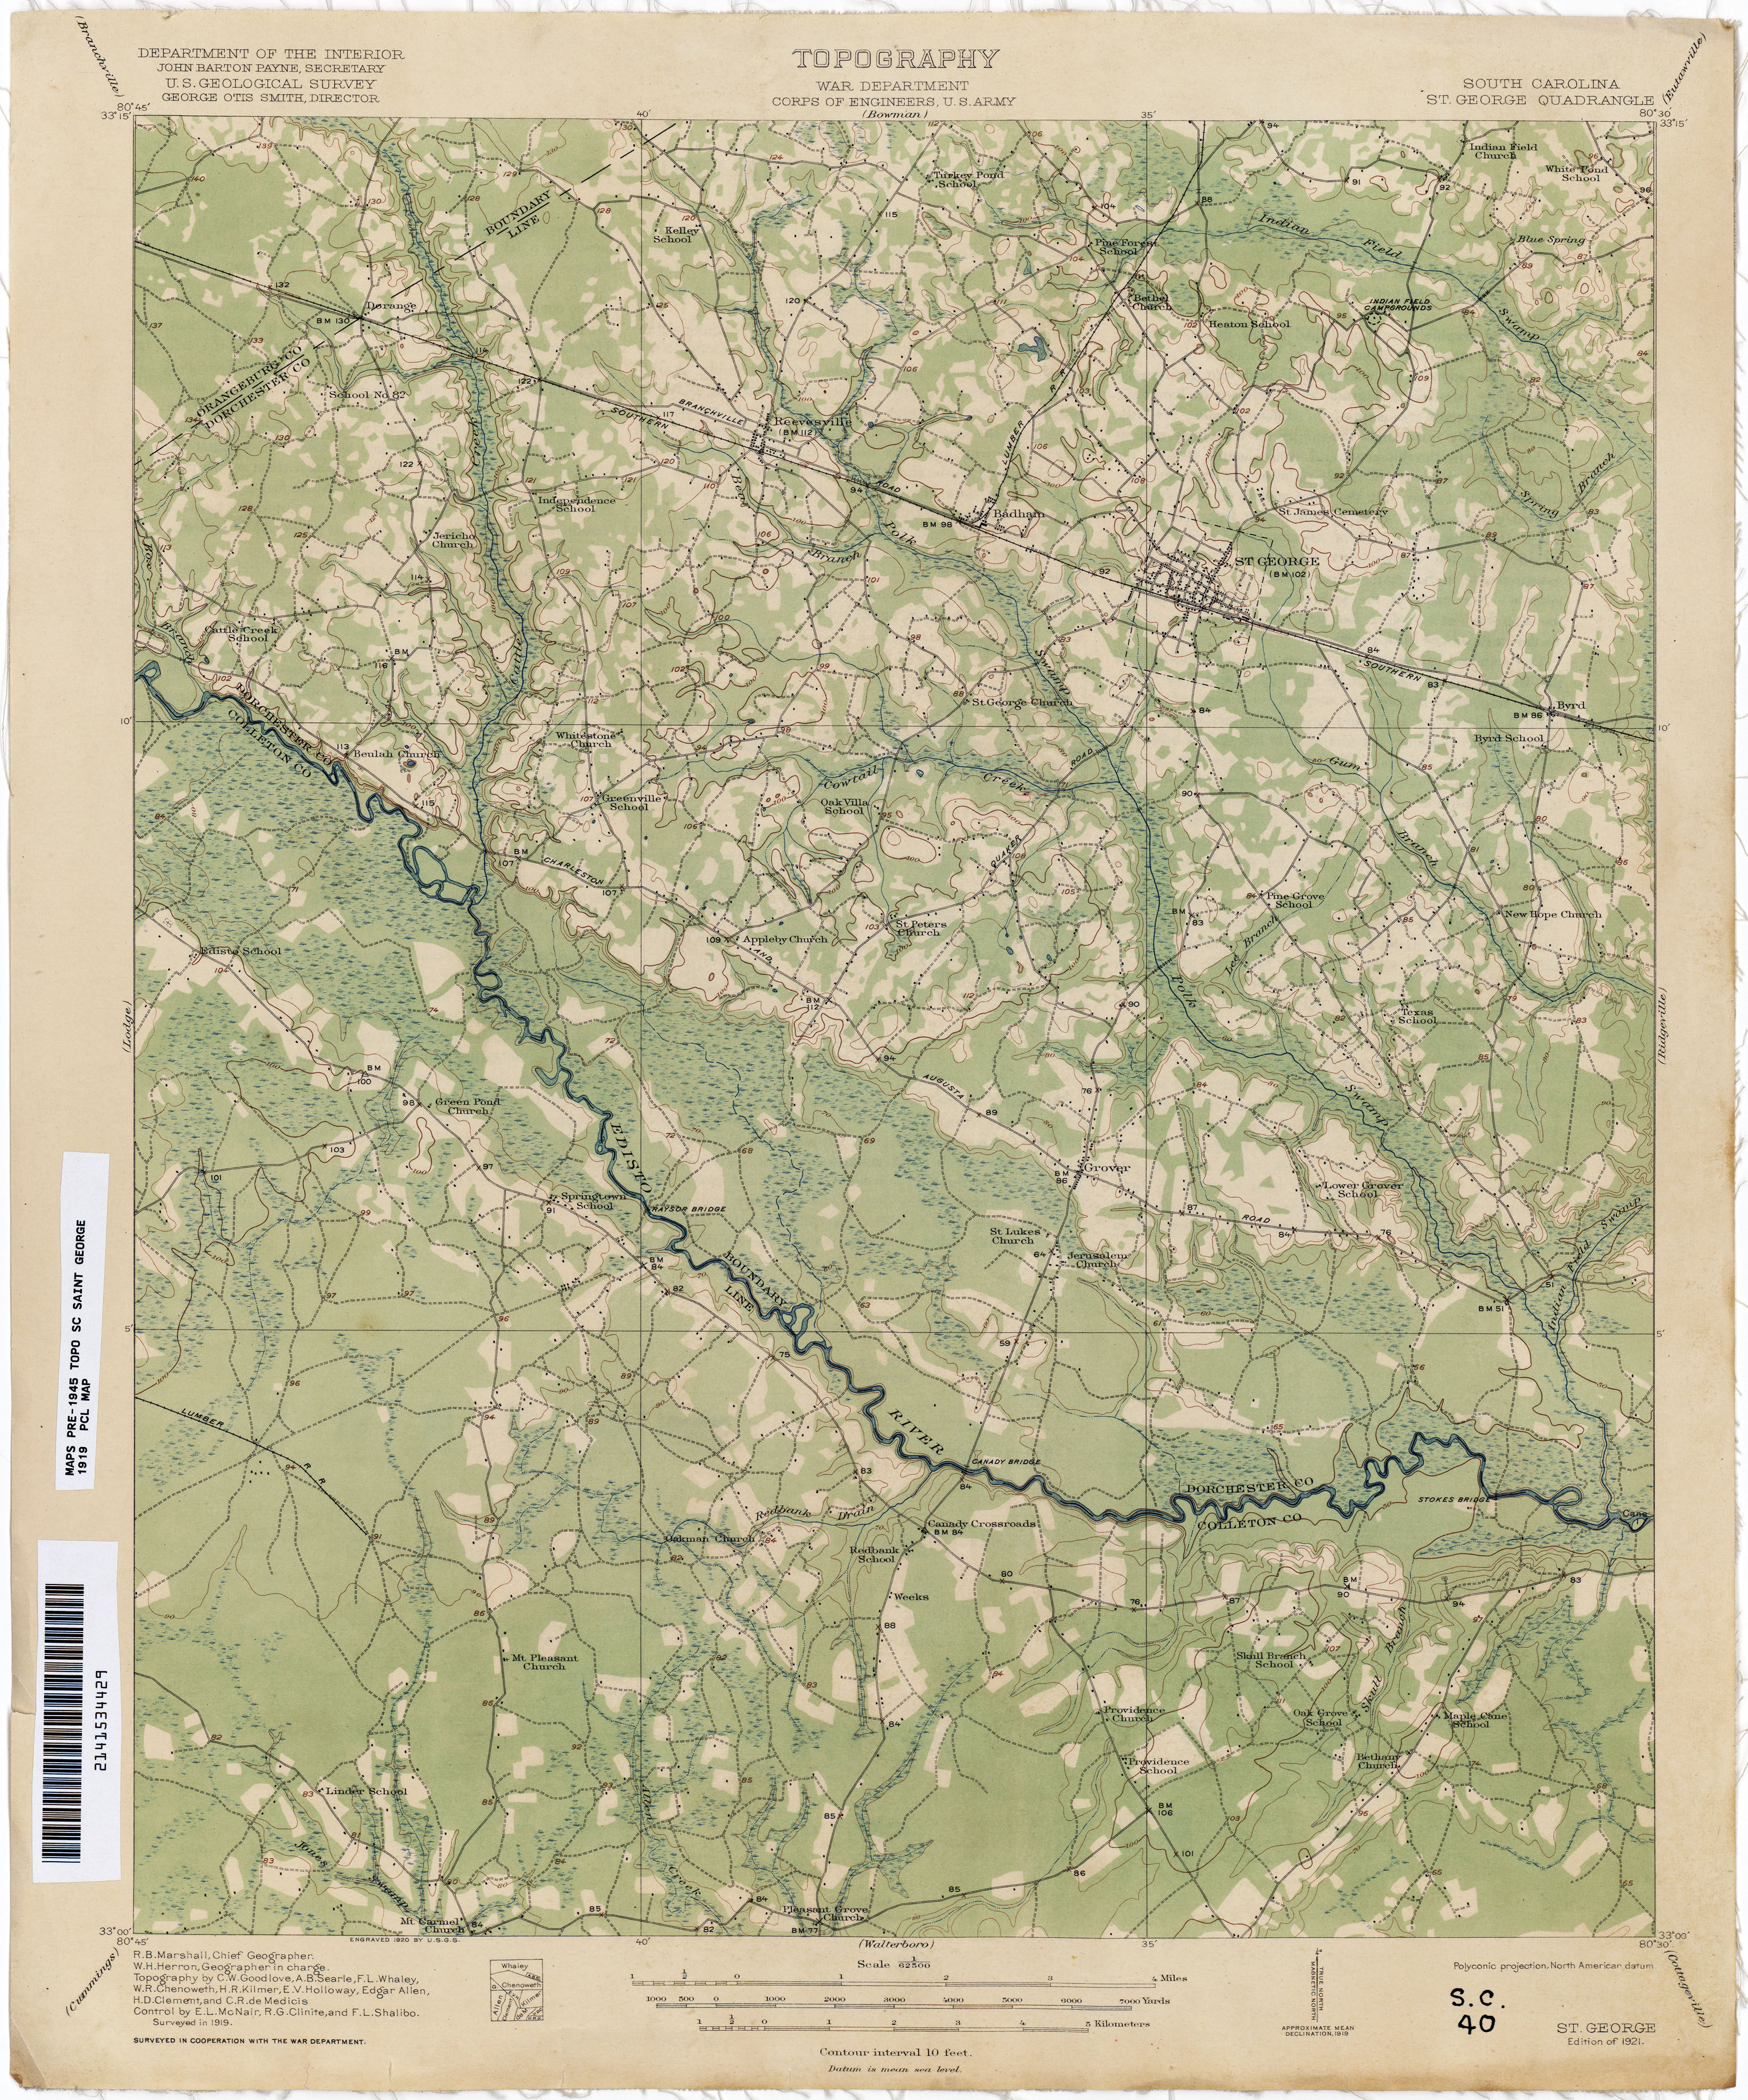 South Carolina Historical Topographic Maps - Perry-Castañeda